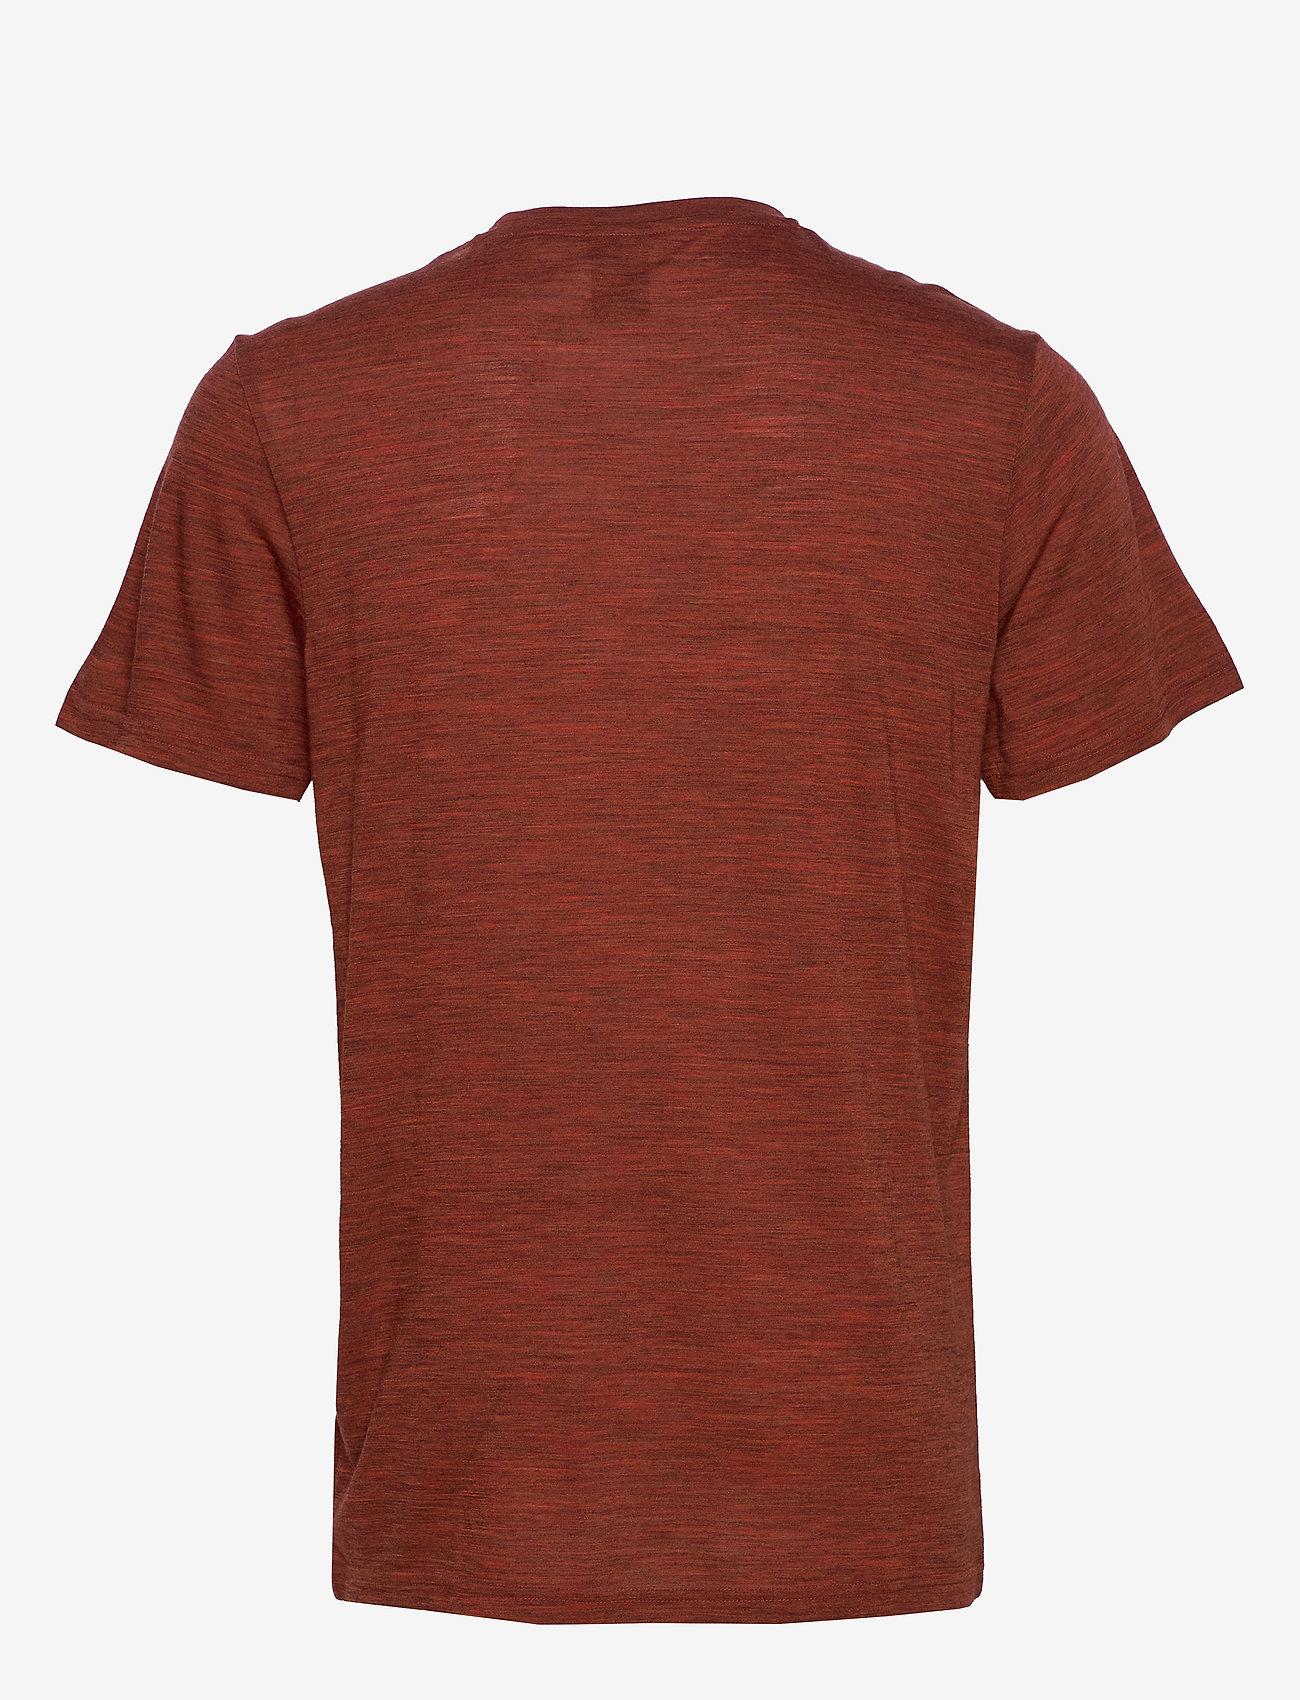 Bula - Pacific Solid Merino Wool Tee - tops - brick - 1